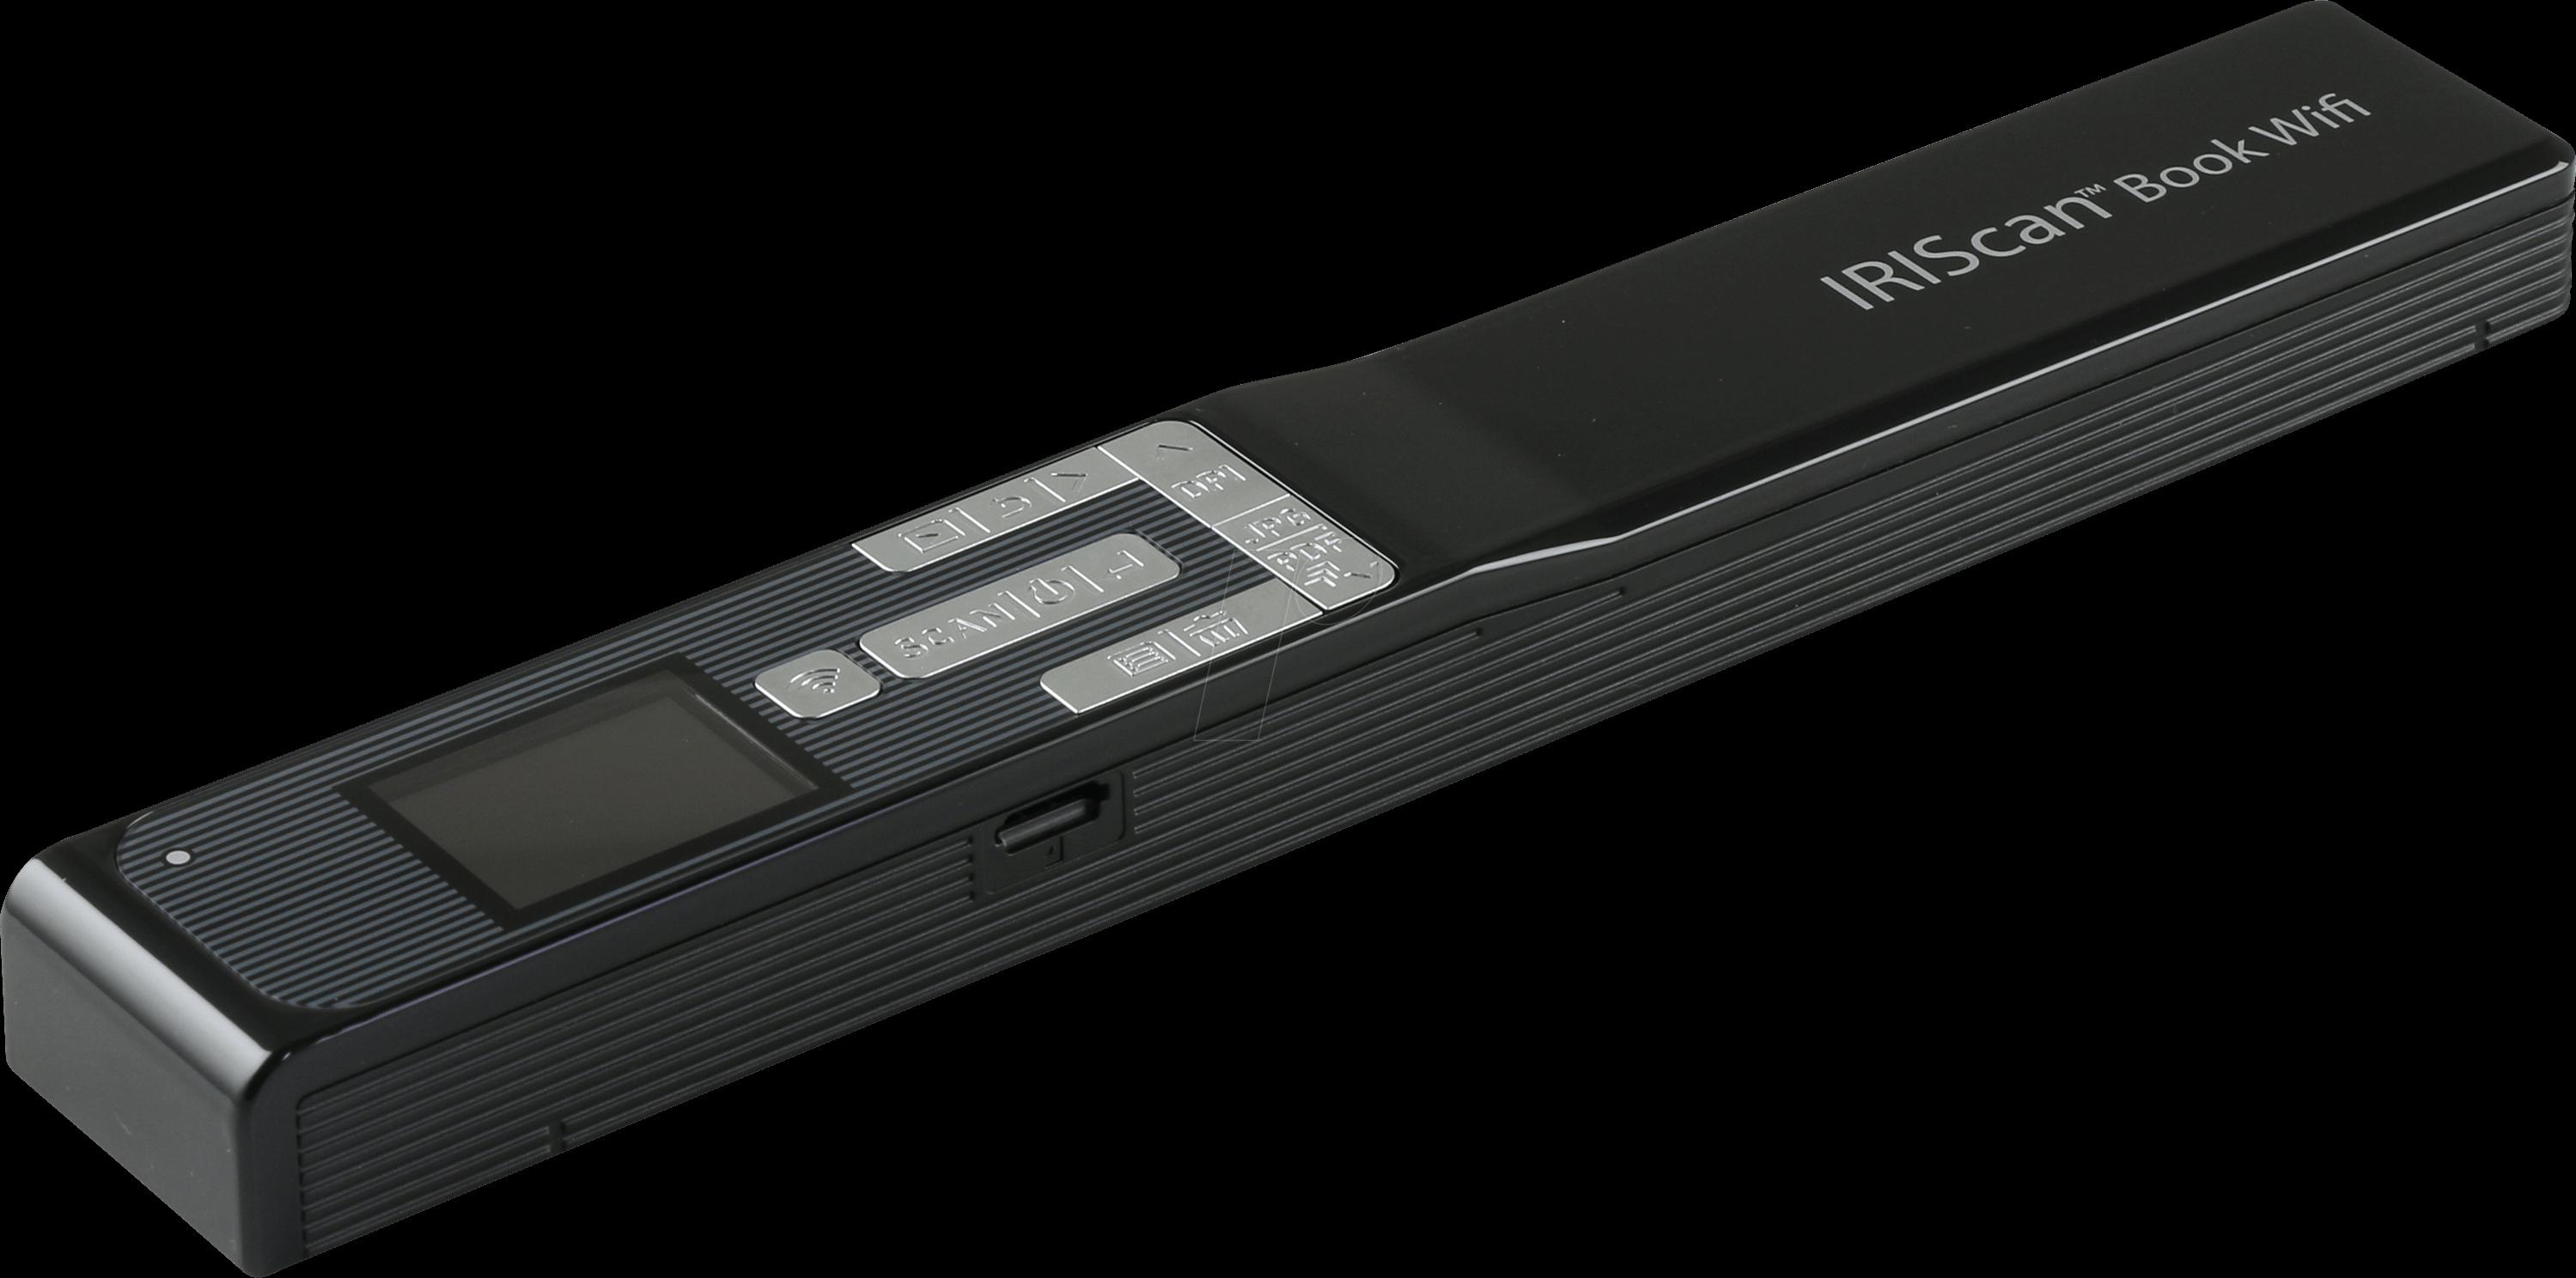 iris 458742 mobiler buch scanner wlan 30 s min. Black Bedroom Furniture Sets. Home Design Ideas